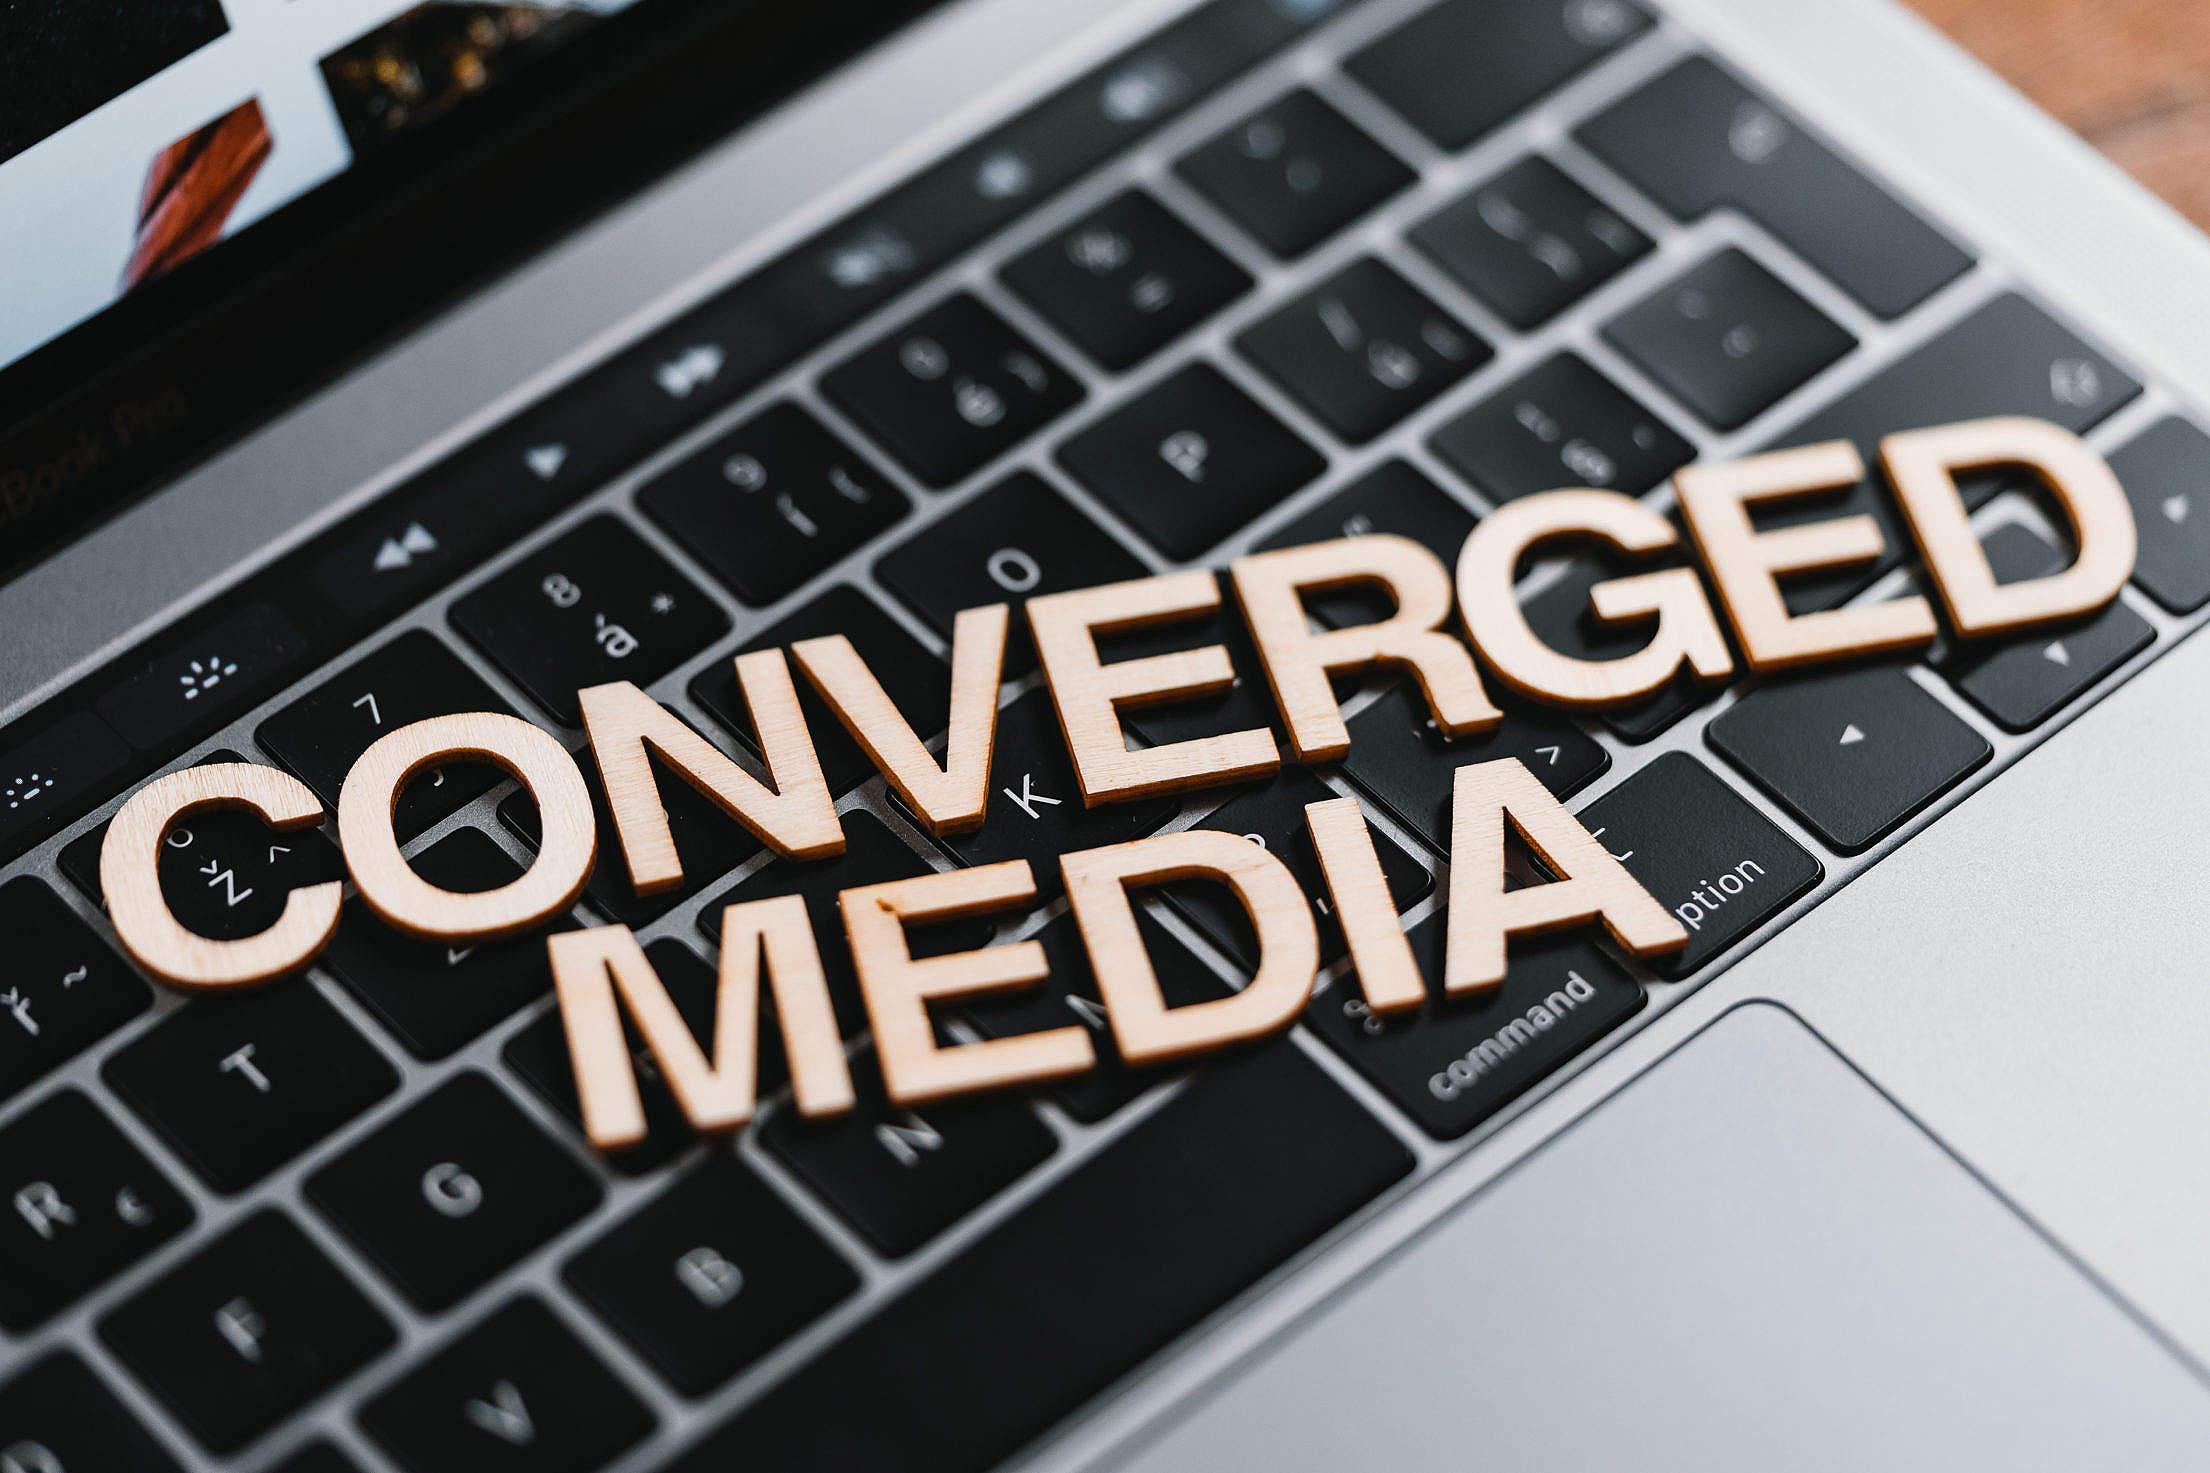 Converged Media Free Stock Photo